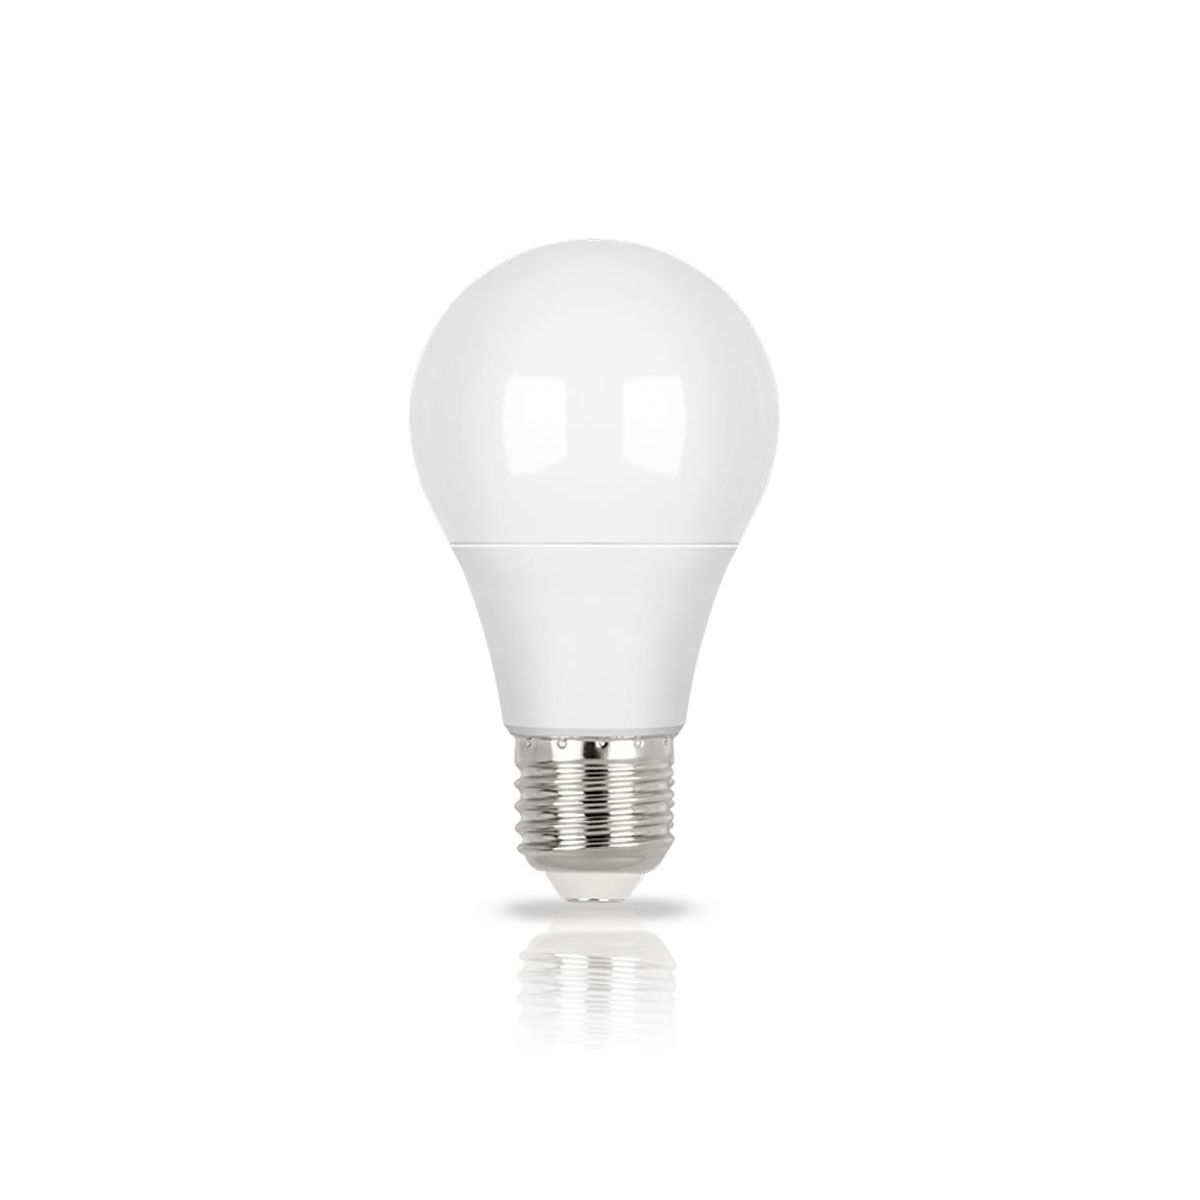 Lâmpada LED Bulbo A60 7W 2700K Branco Quente Bivolt - STELLA -STH8264/27